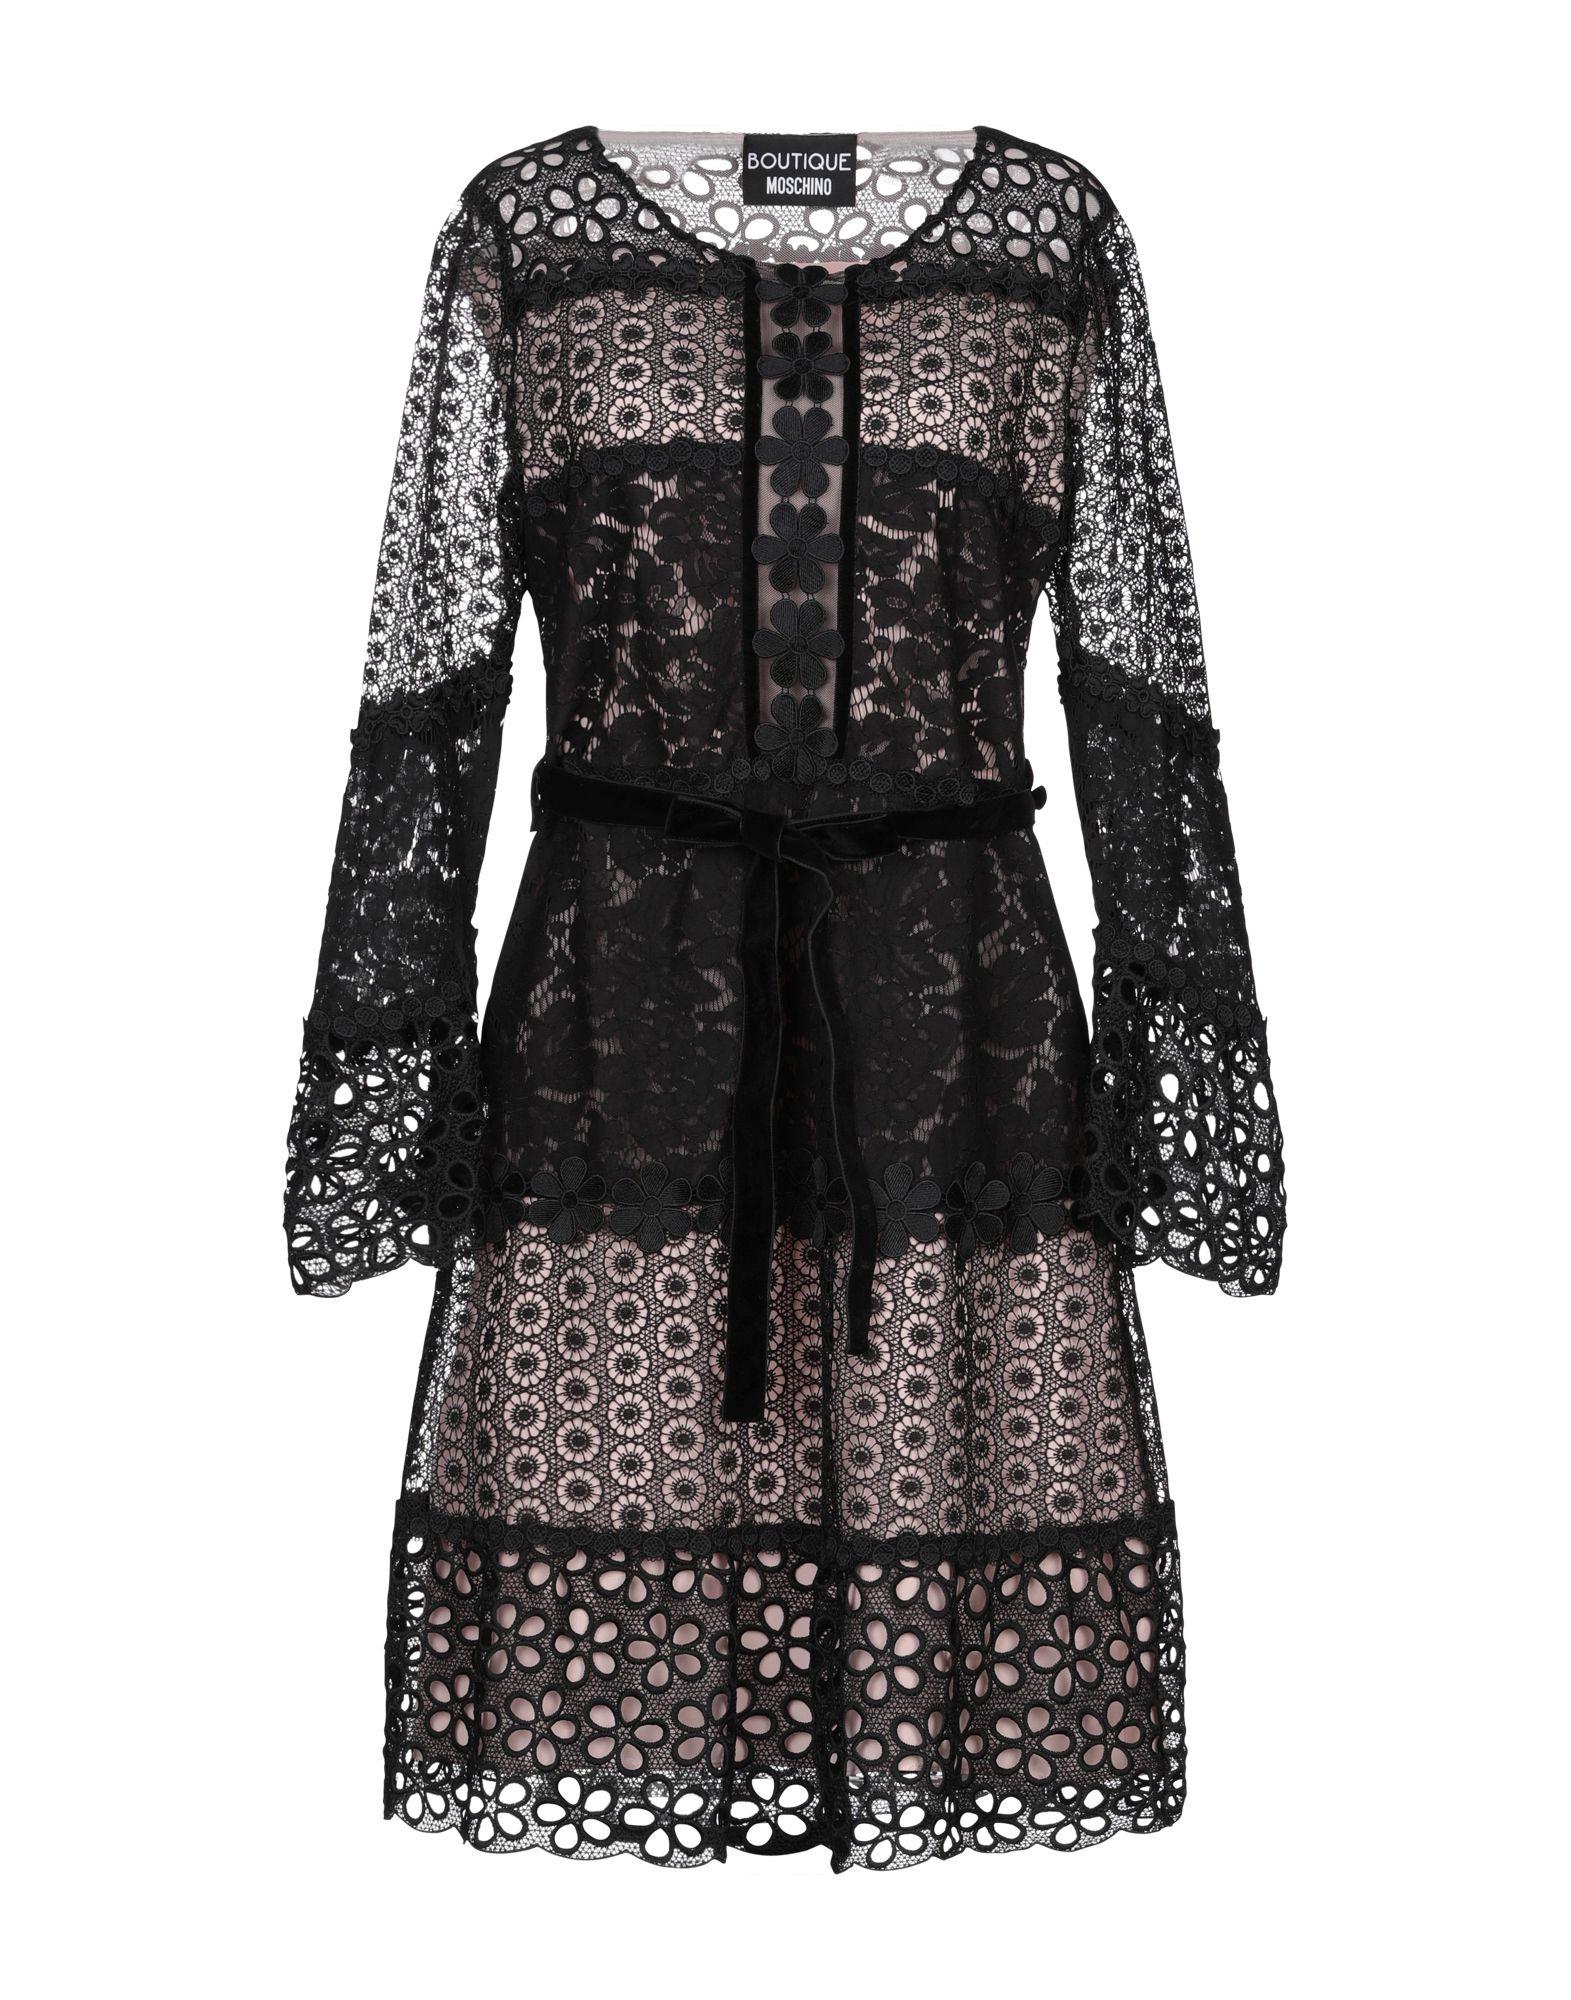 BOUTIQUE MOSCHINO Платье до колена